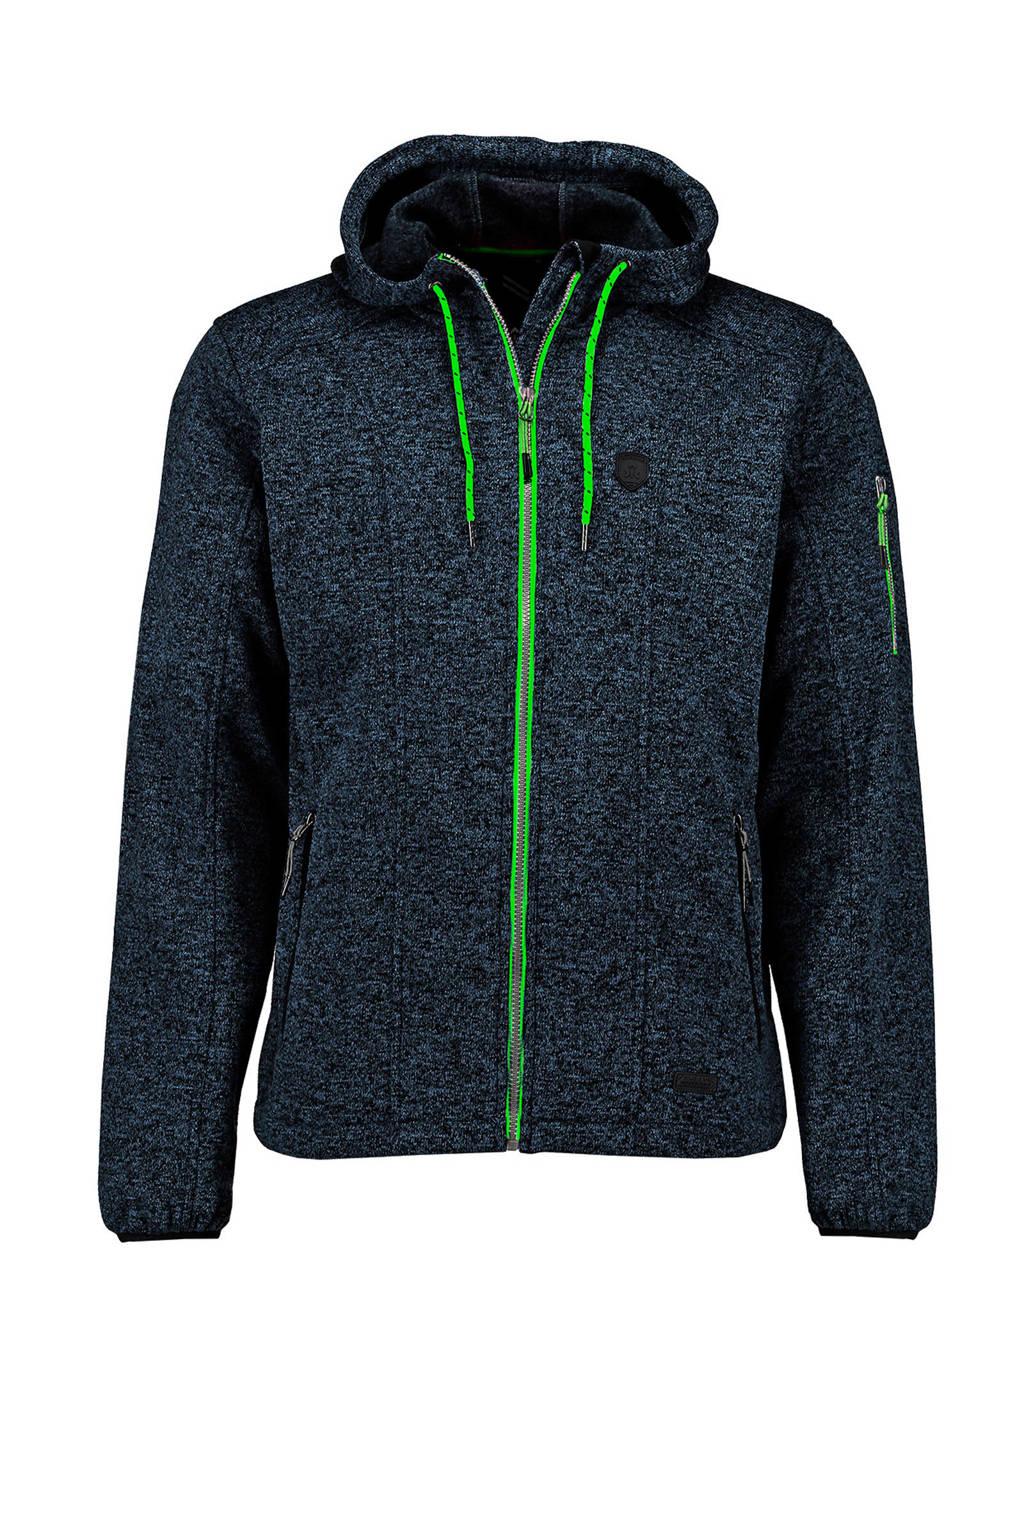 Kjelvik   fleece vest Ury donkerblauw/groen, Donkerblauw